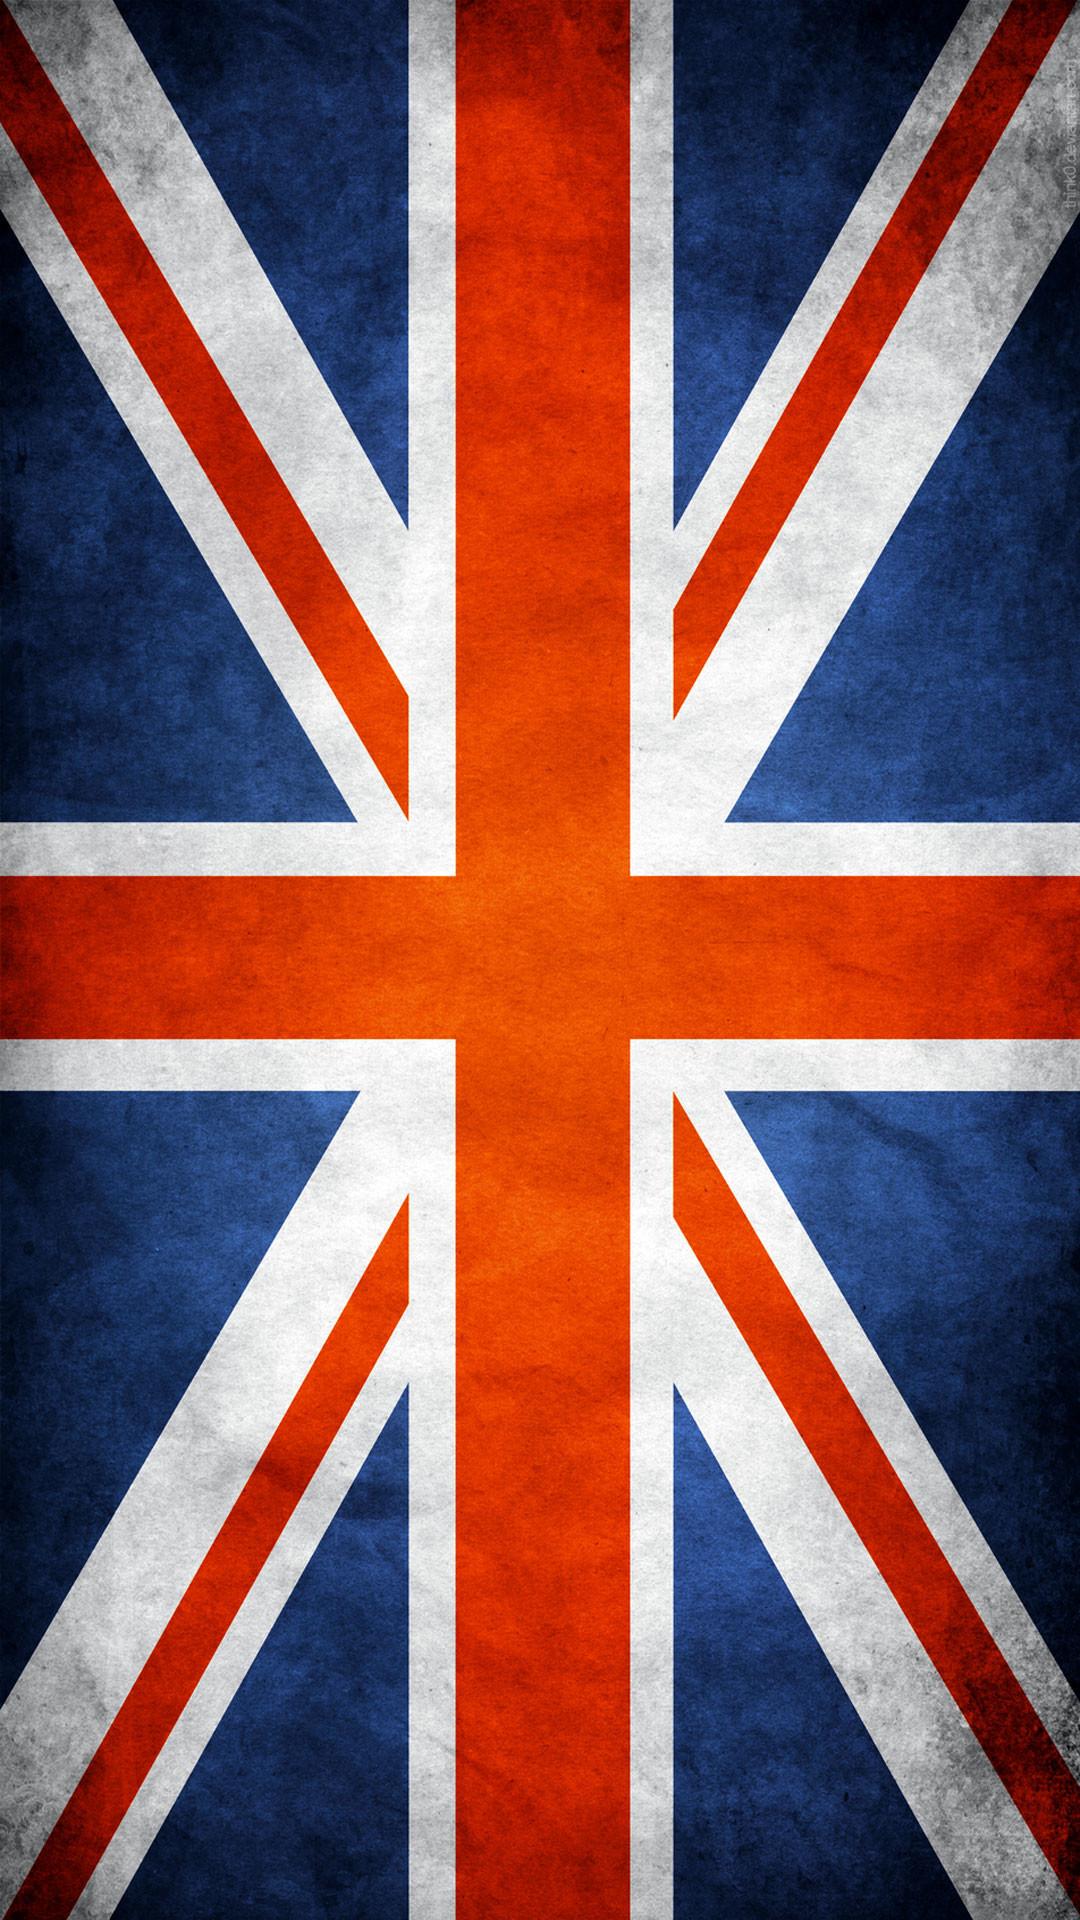 скачать Union Jack 360 X 640 Wallpapers – 2695326 – union jack flag united  kingdom